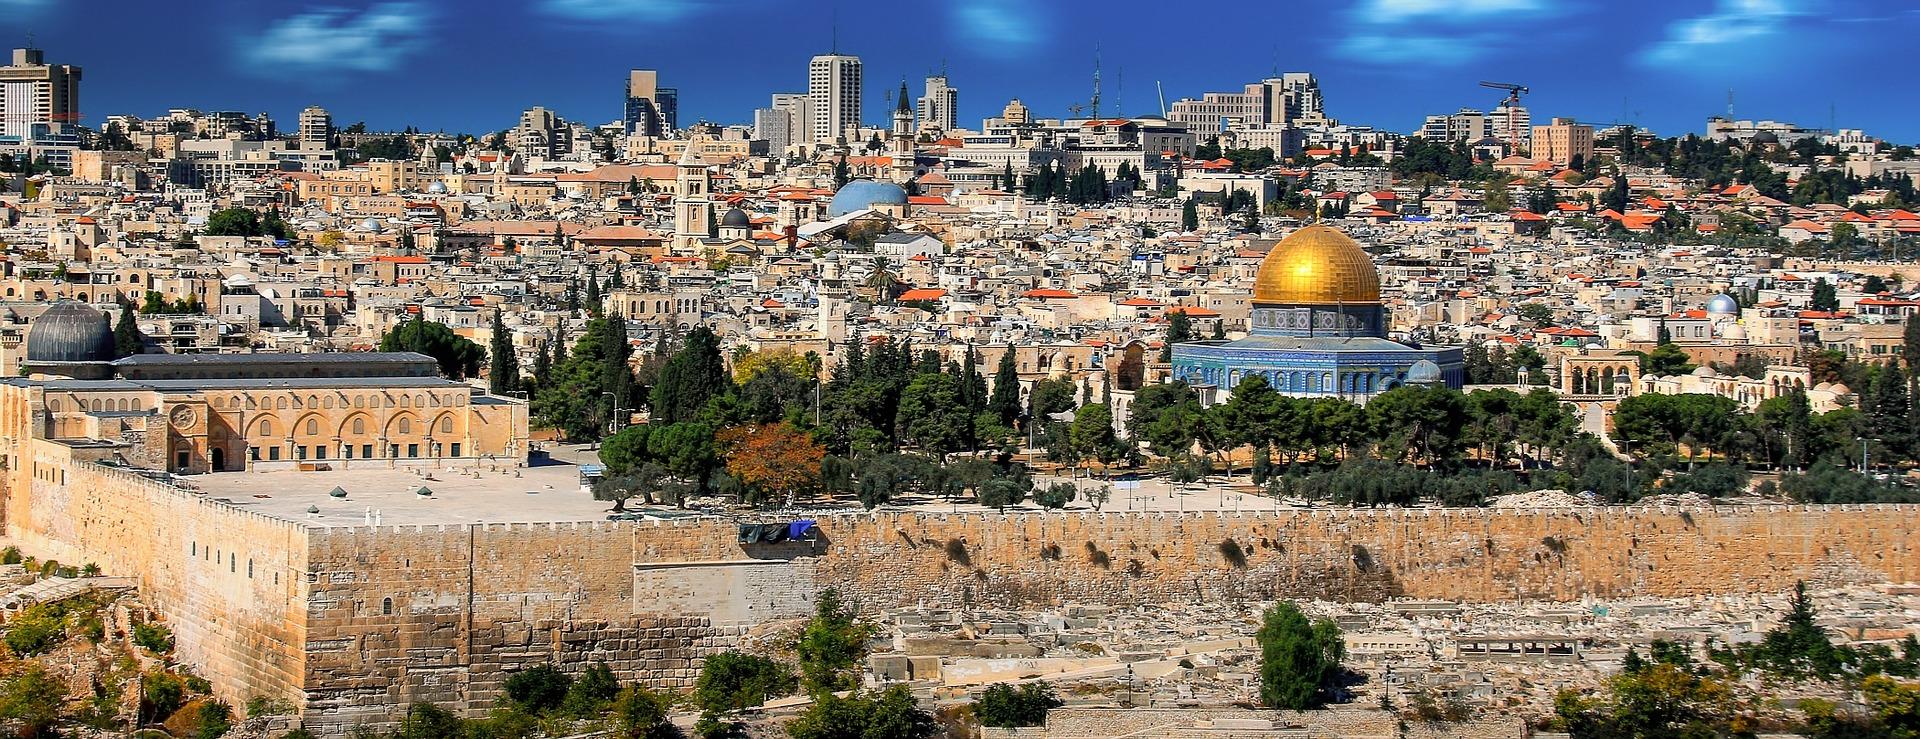 jerusalem-1712855_1920.jpg